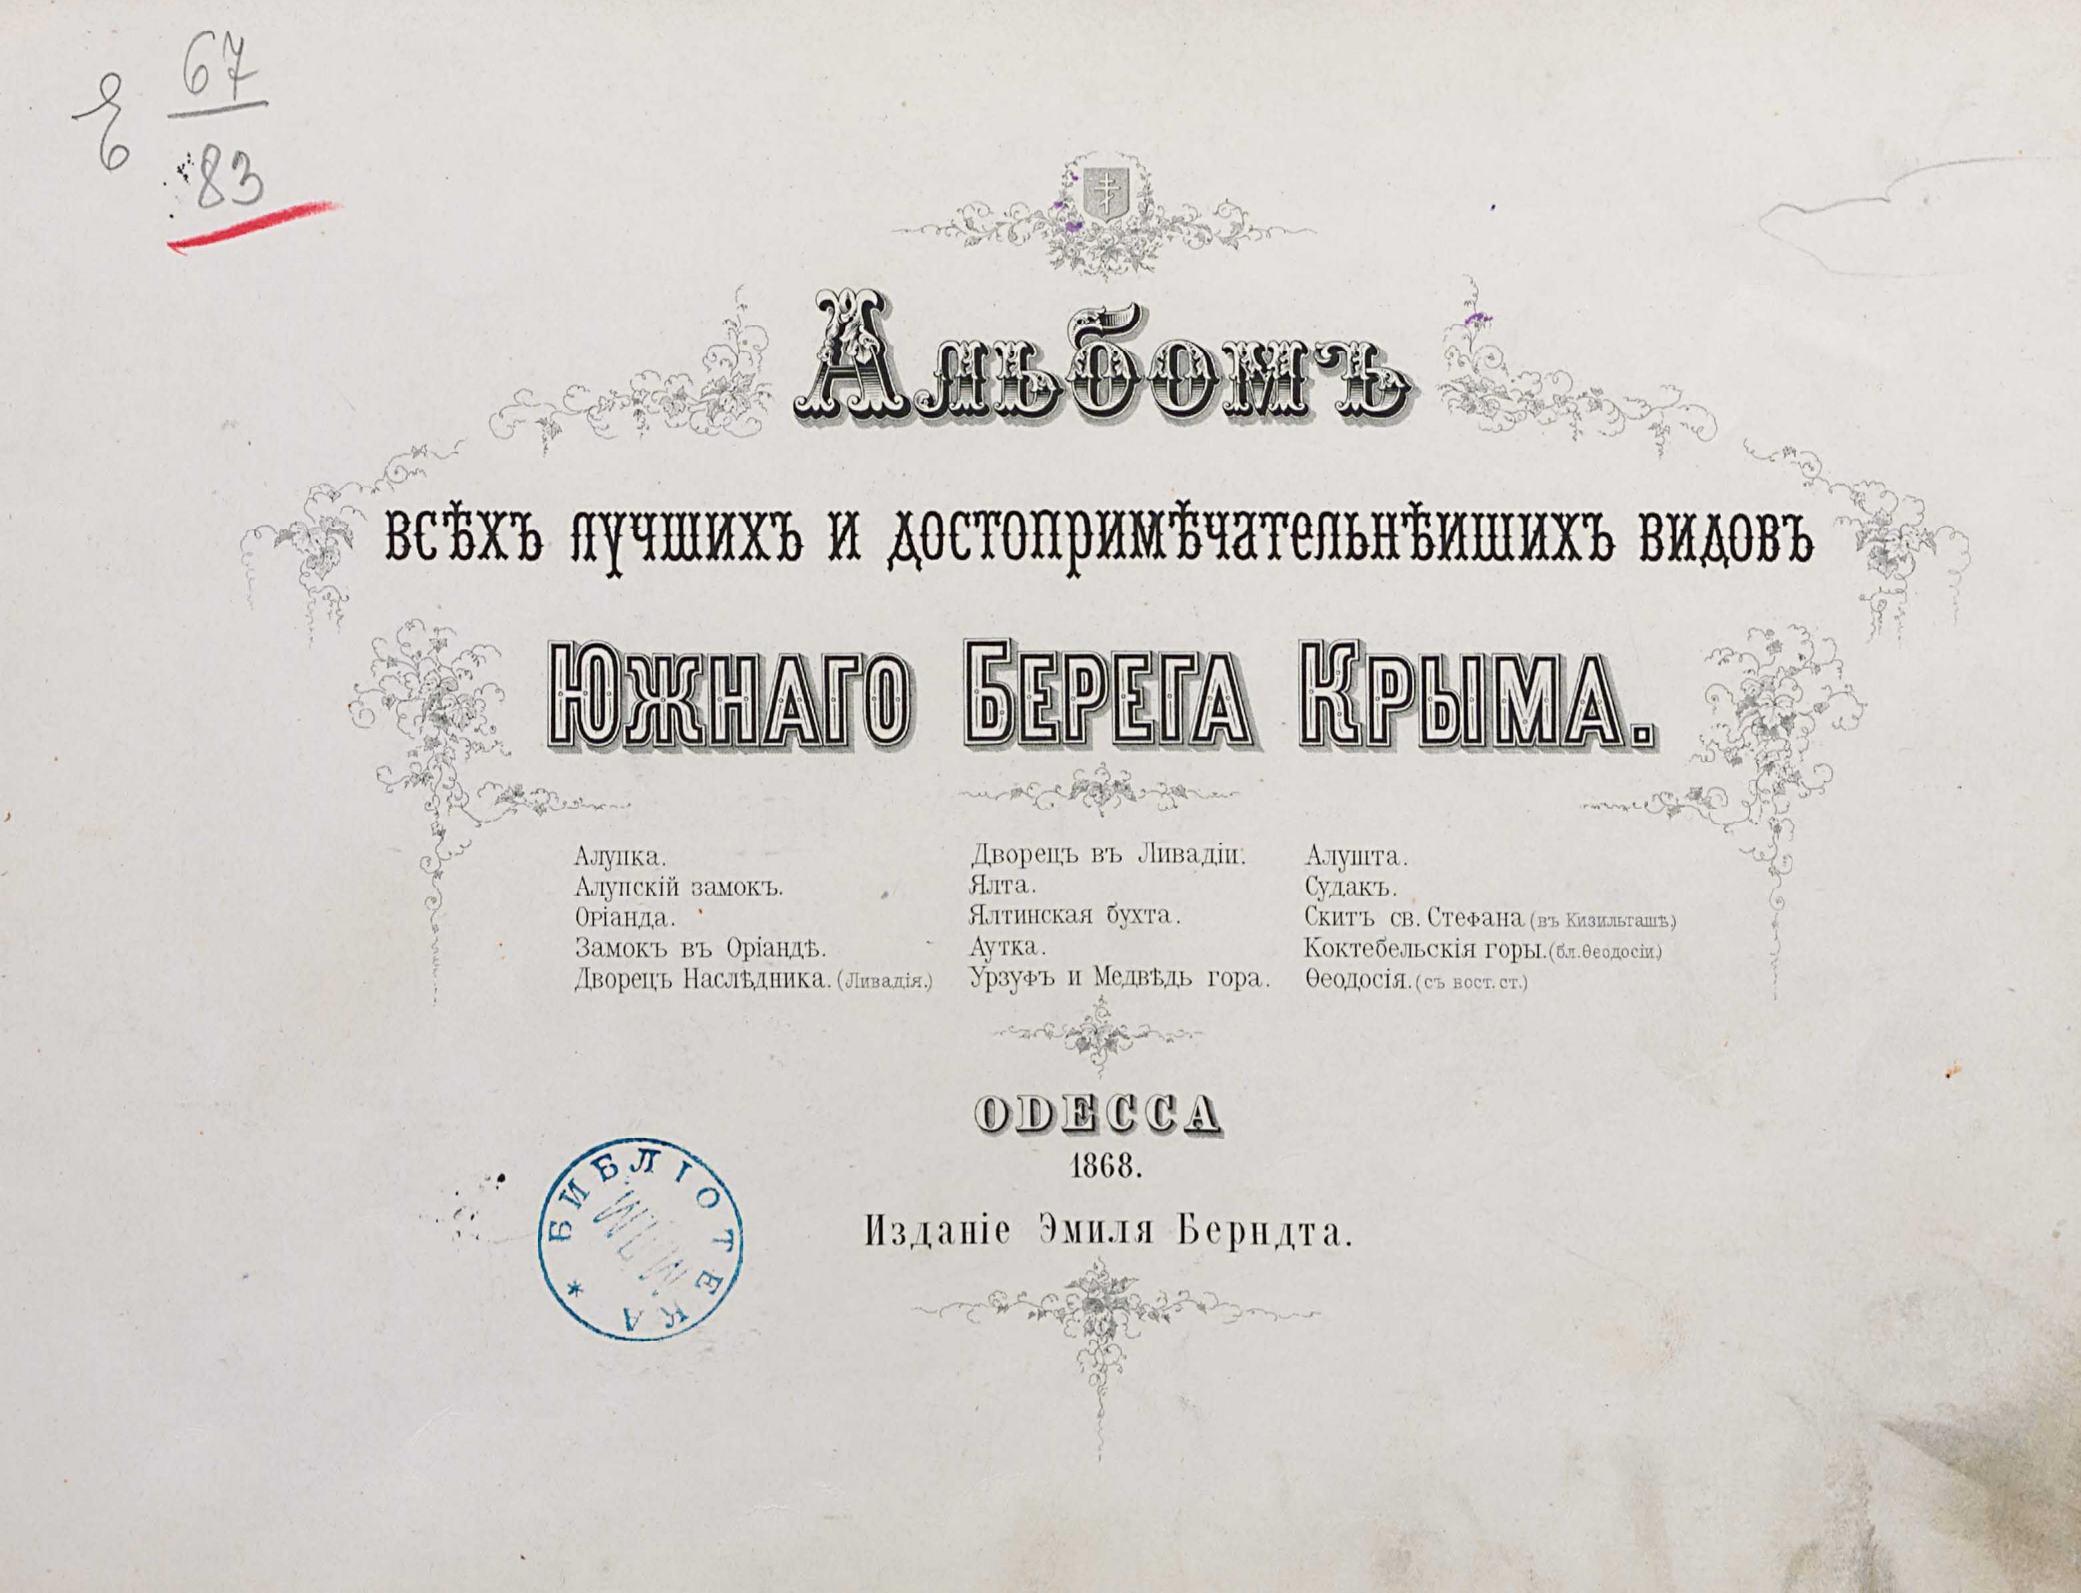 albom-vidov-iuzhnogo-berega-kryma-1868-sample-002.jpg